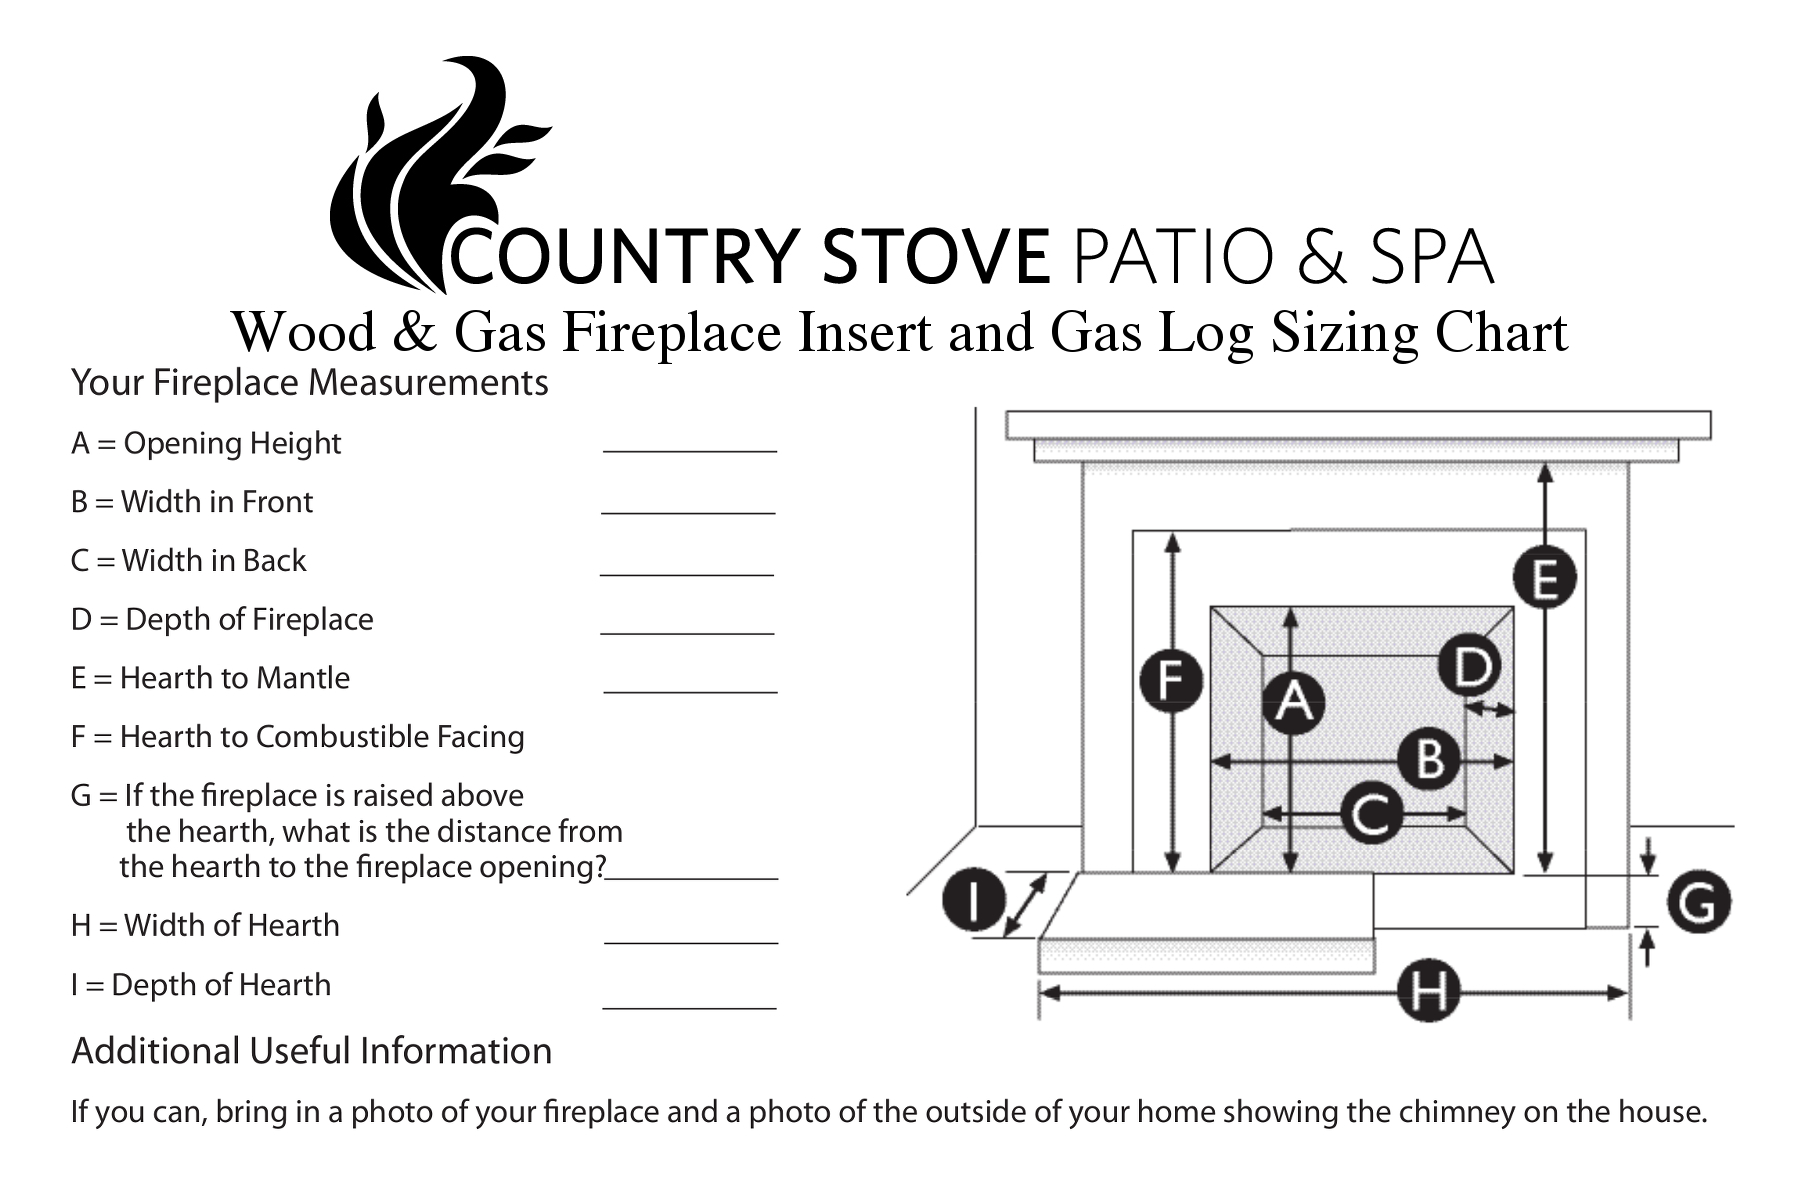 Fireplace Measurement Sheet